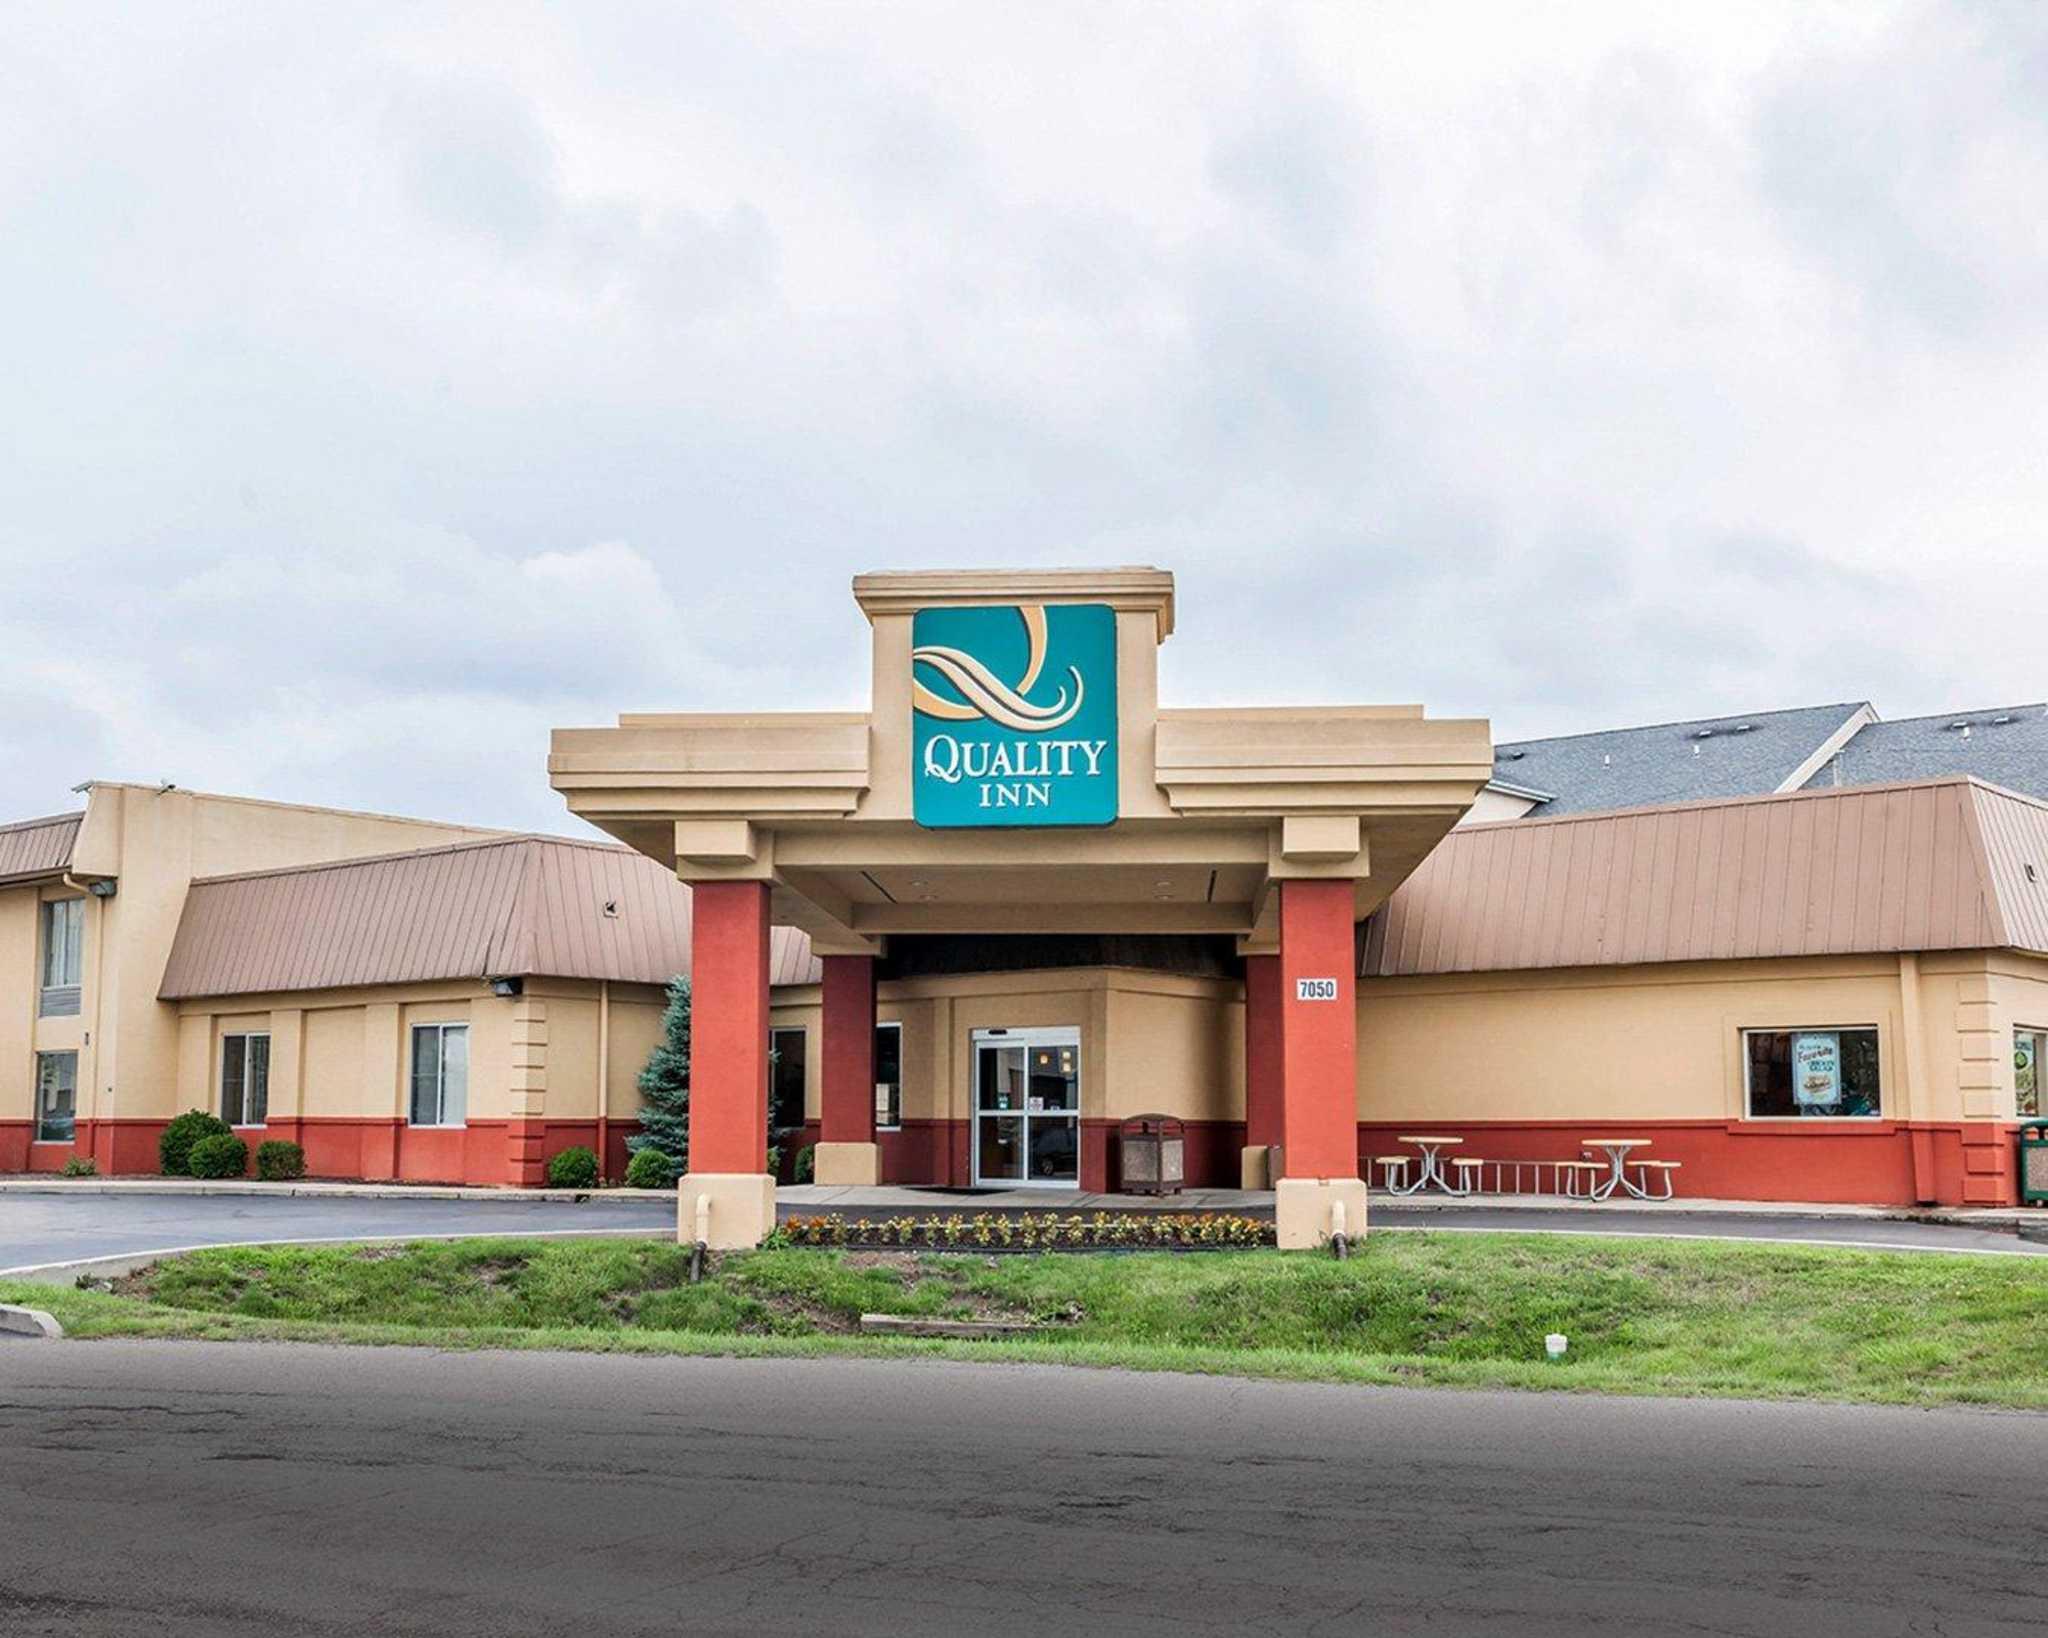 Quality Inn East image 0